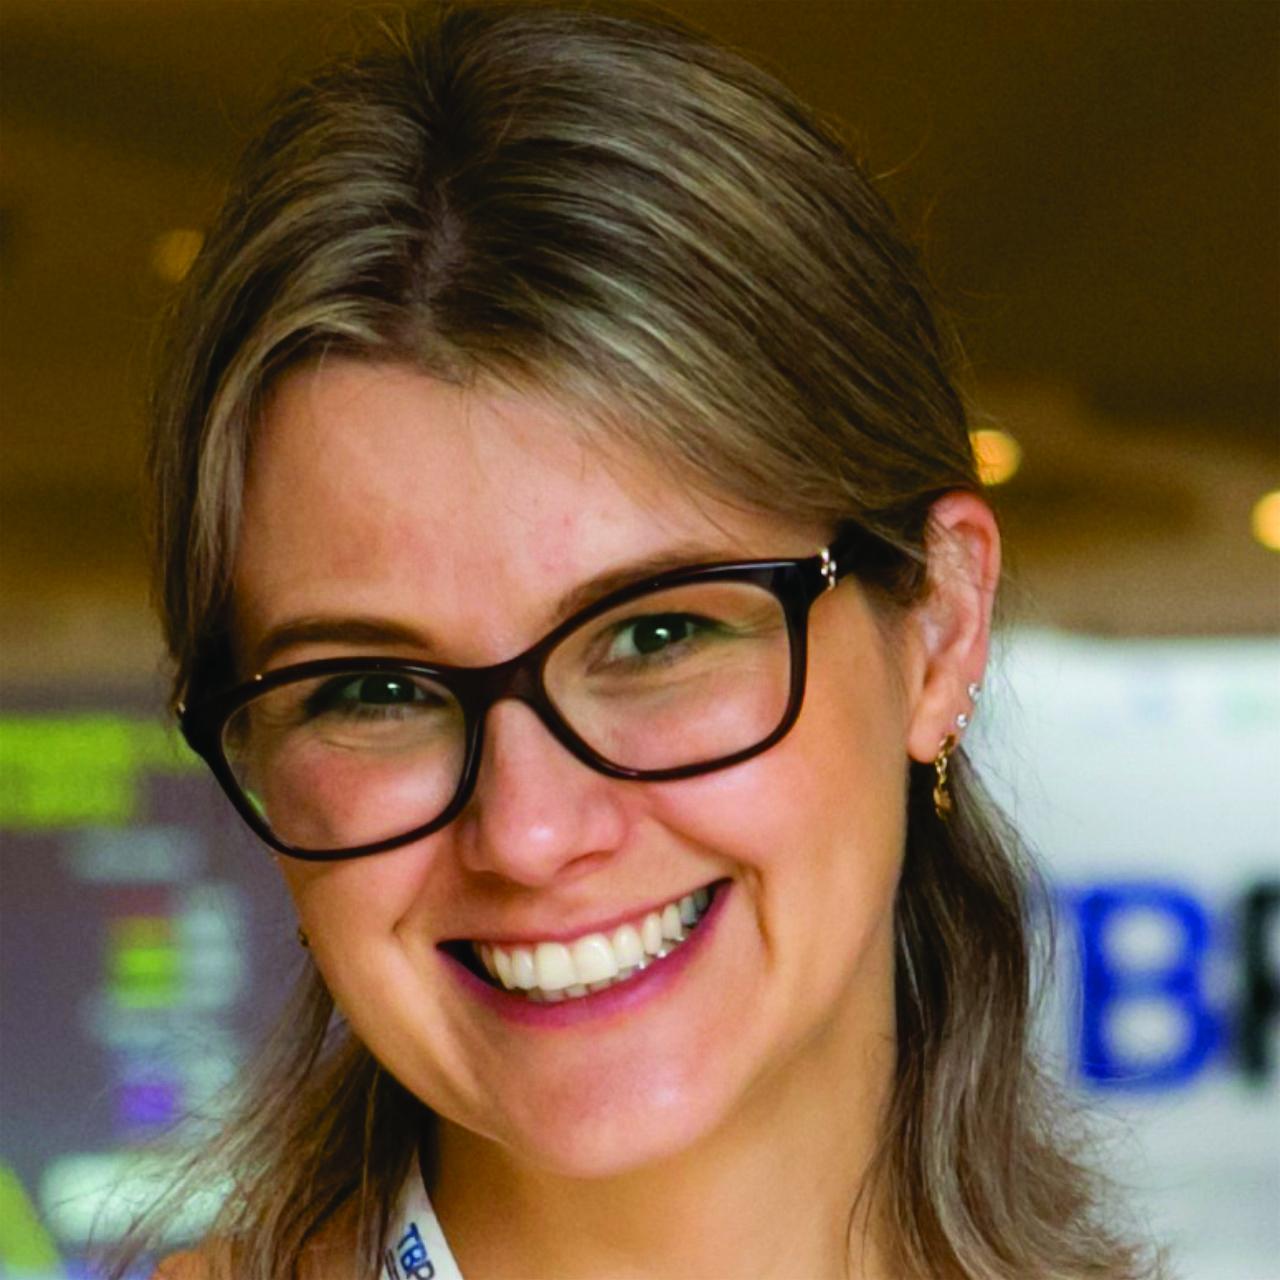 Marcia Polese Bonatto